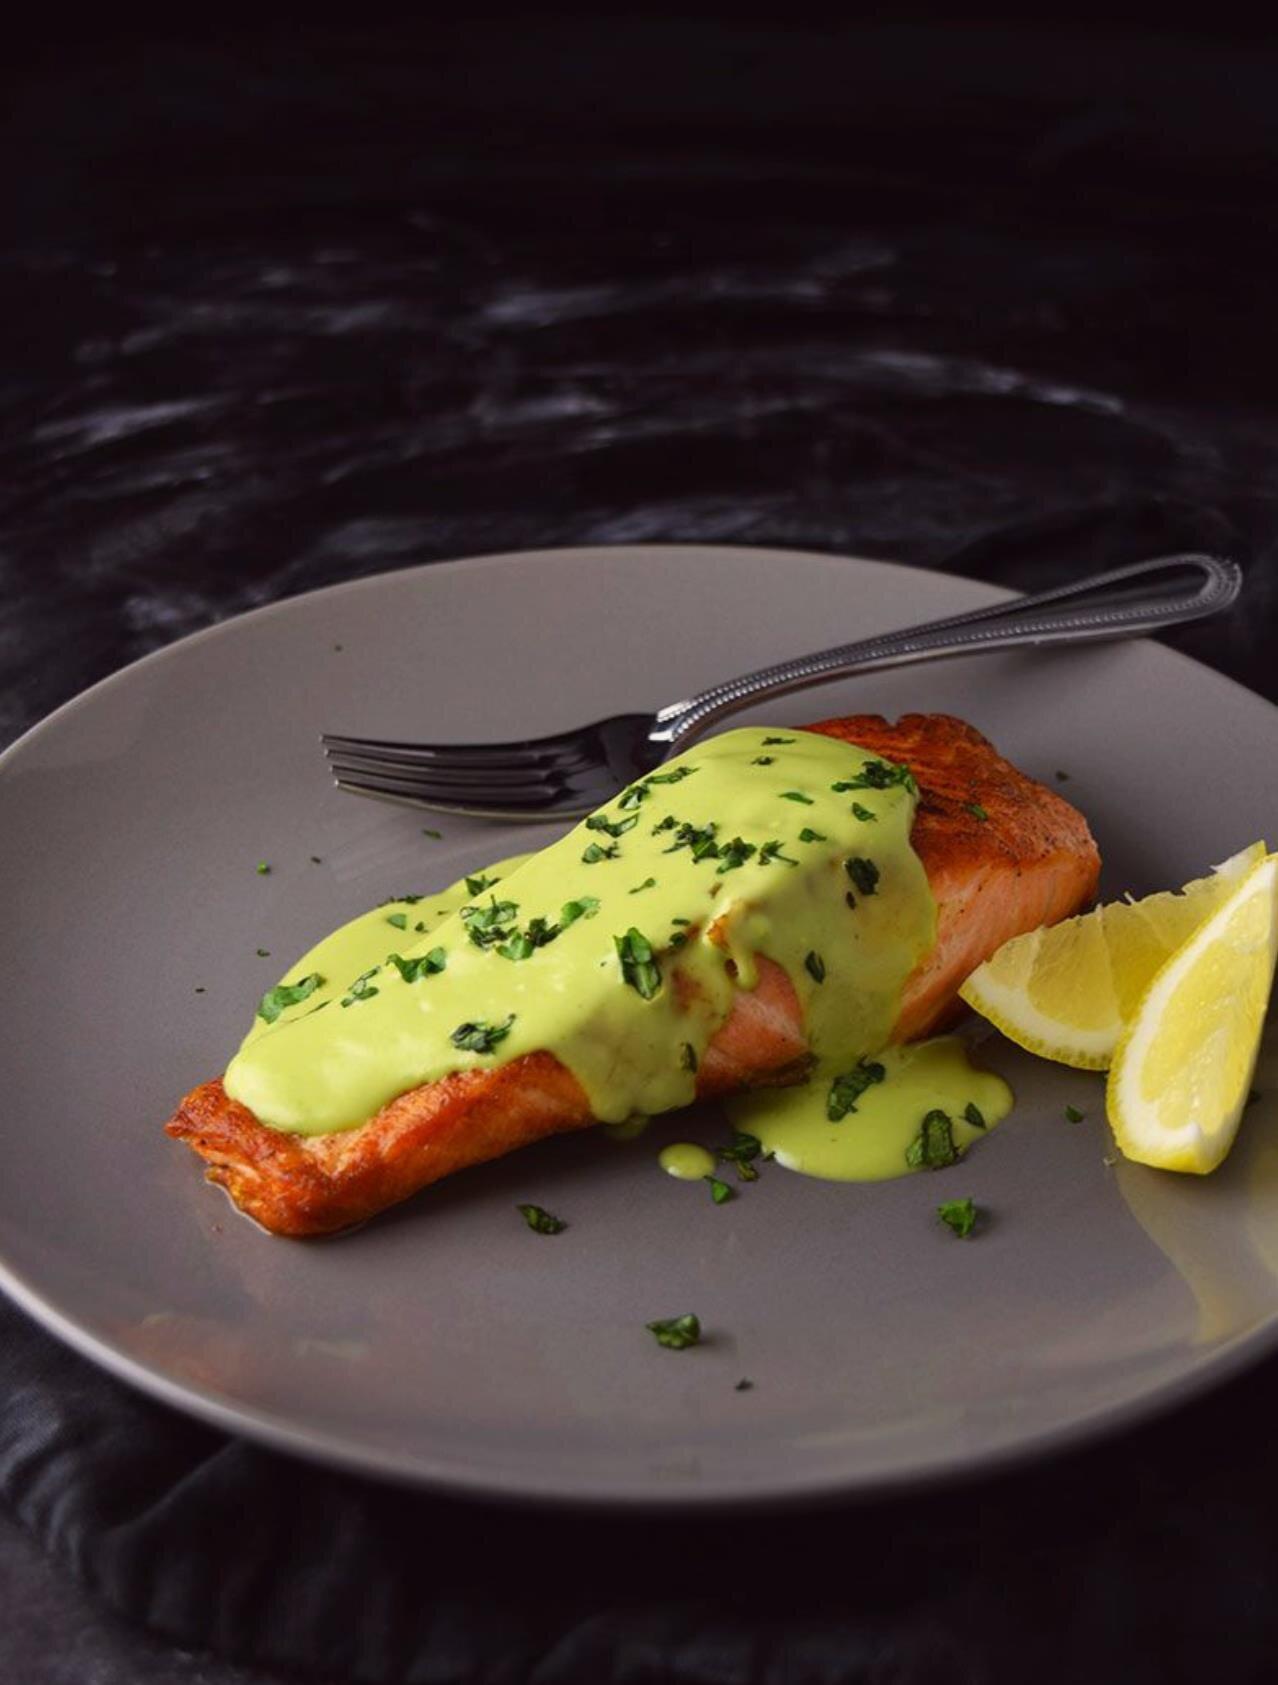 pan seared salmon with creamy avocado sauce